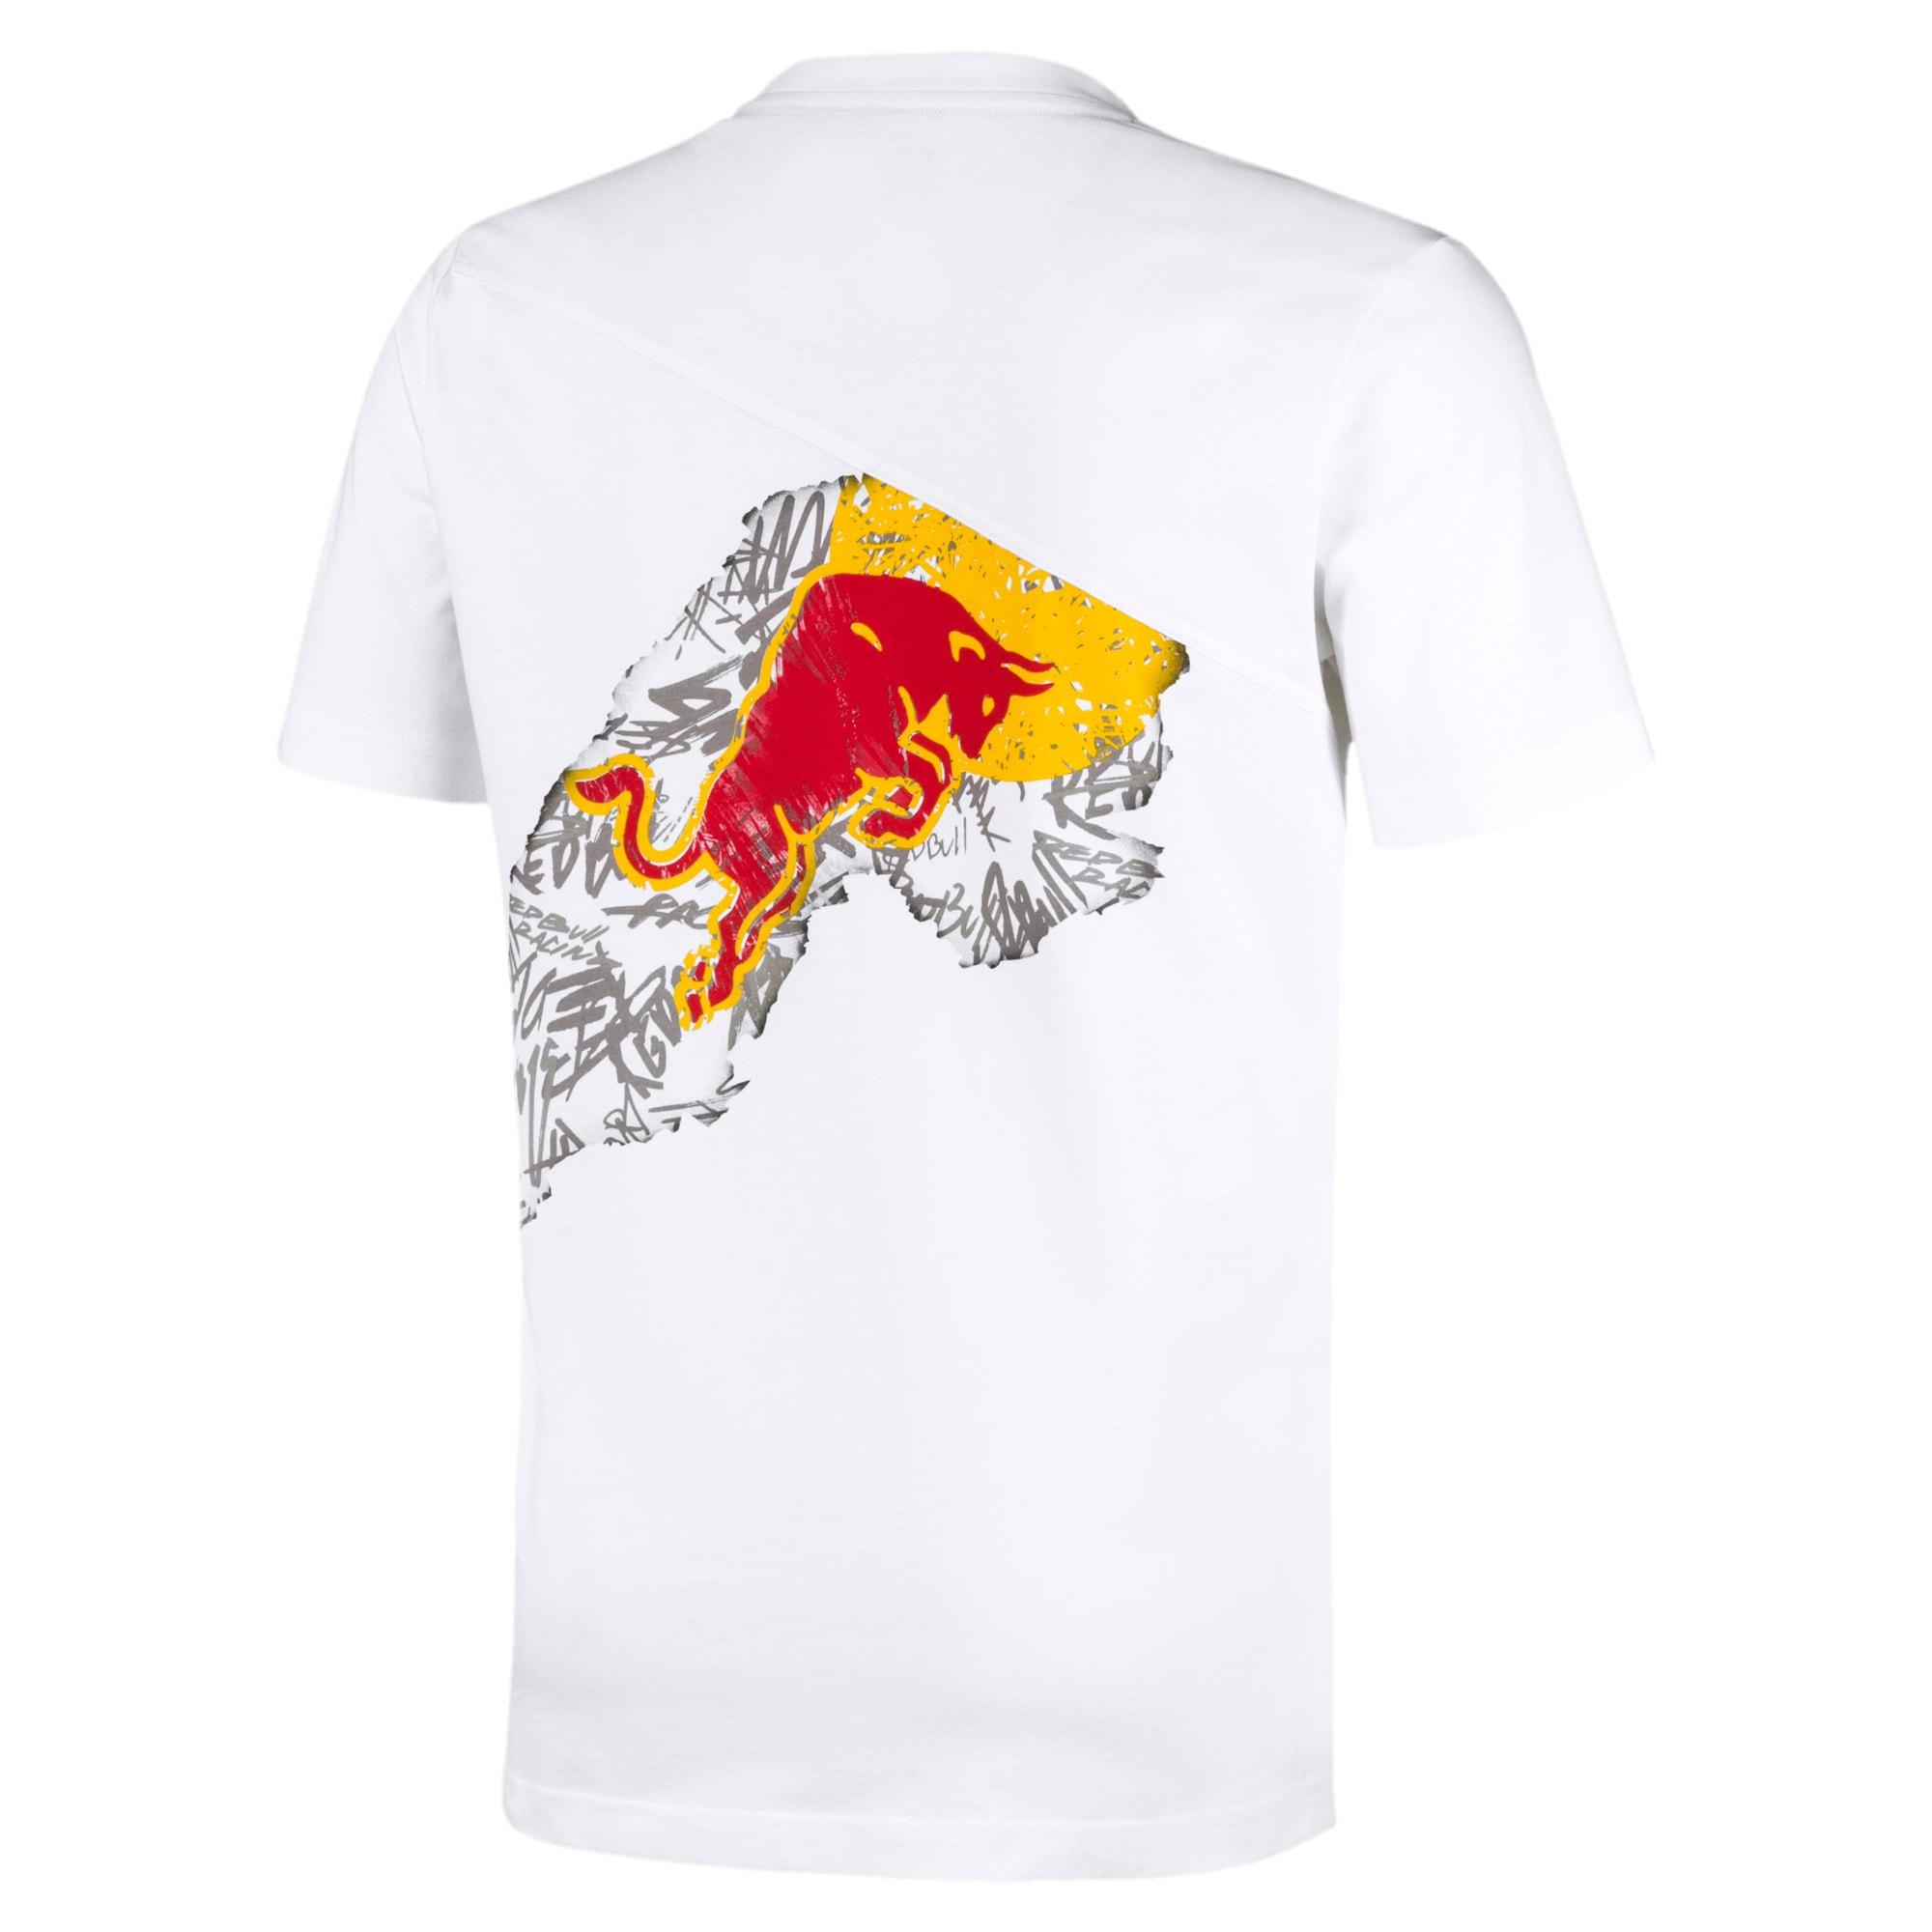 Thumbnail 5 of Red Bull Racing Dynamic Bull Men's Tee, Puma White, medium